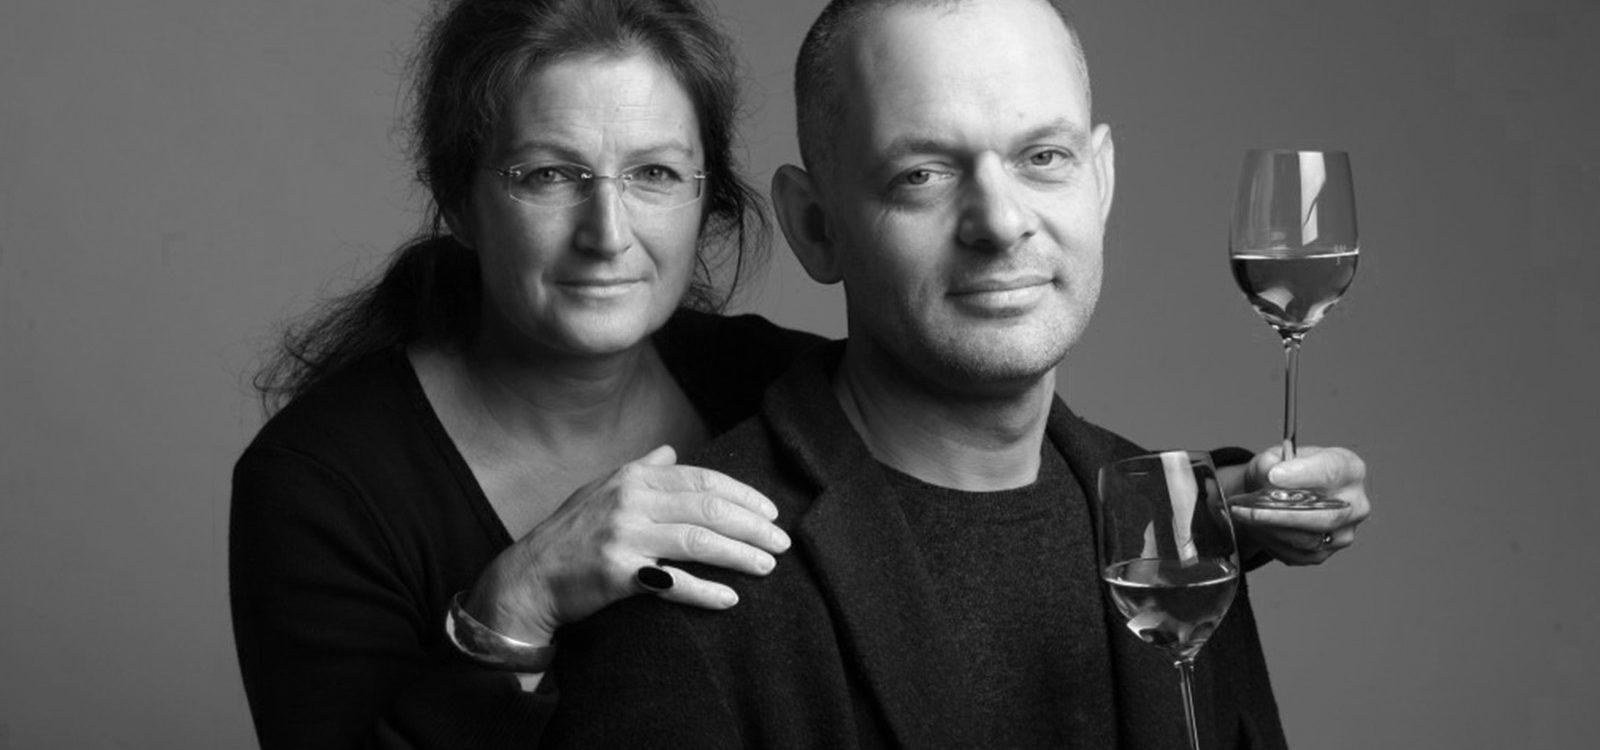 Frank & Manuela Meyer - Stiftsweingut Frank Meyer